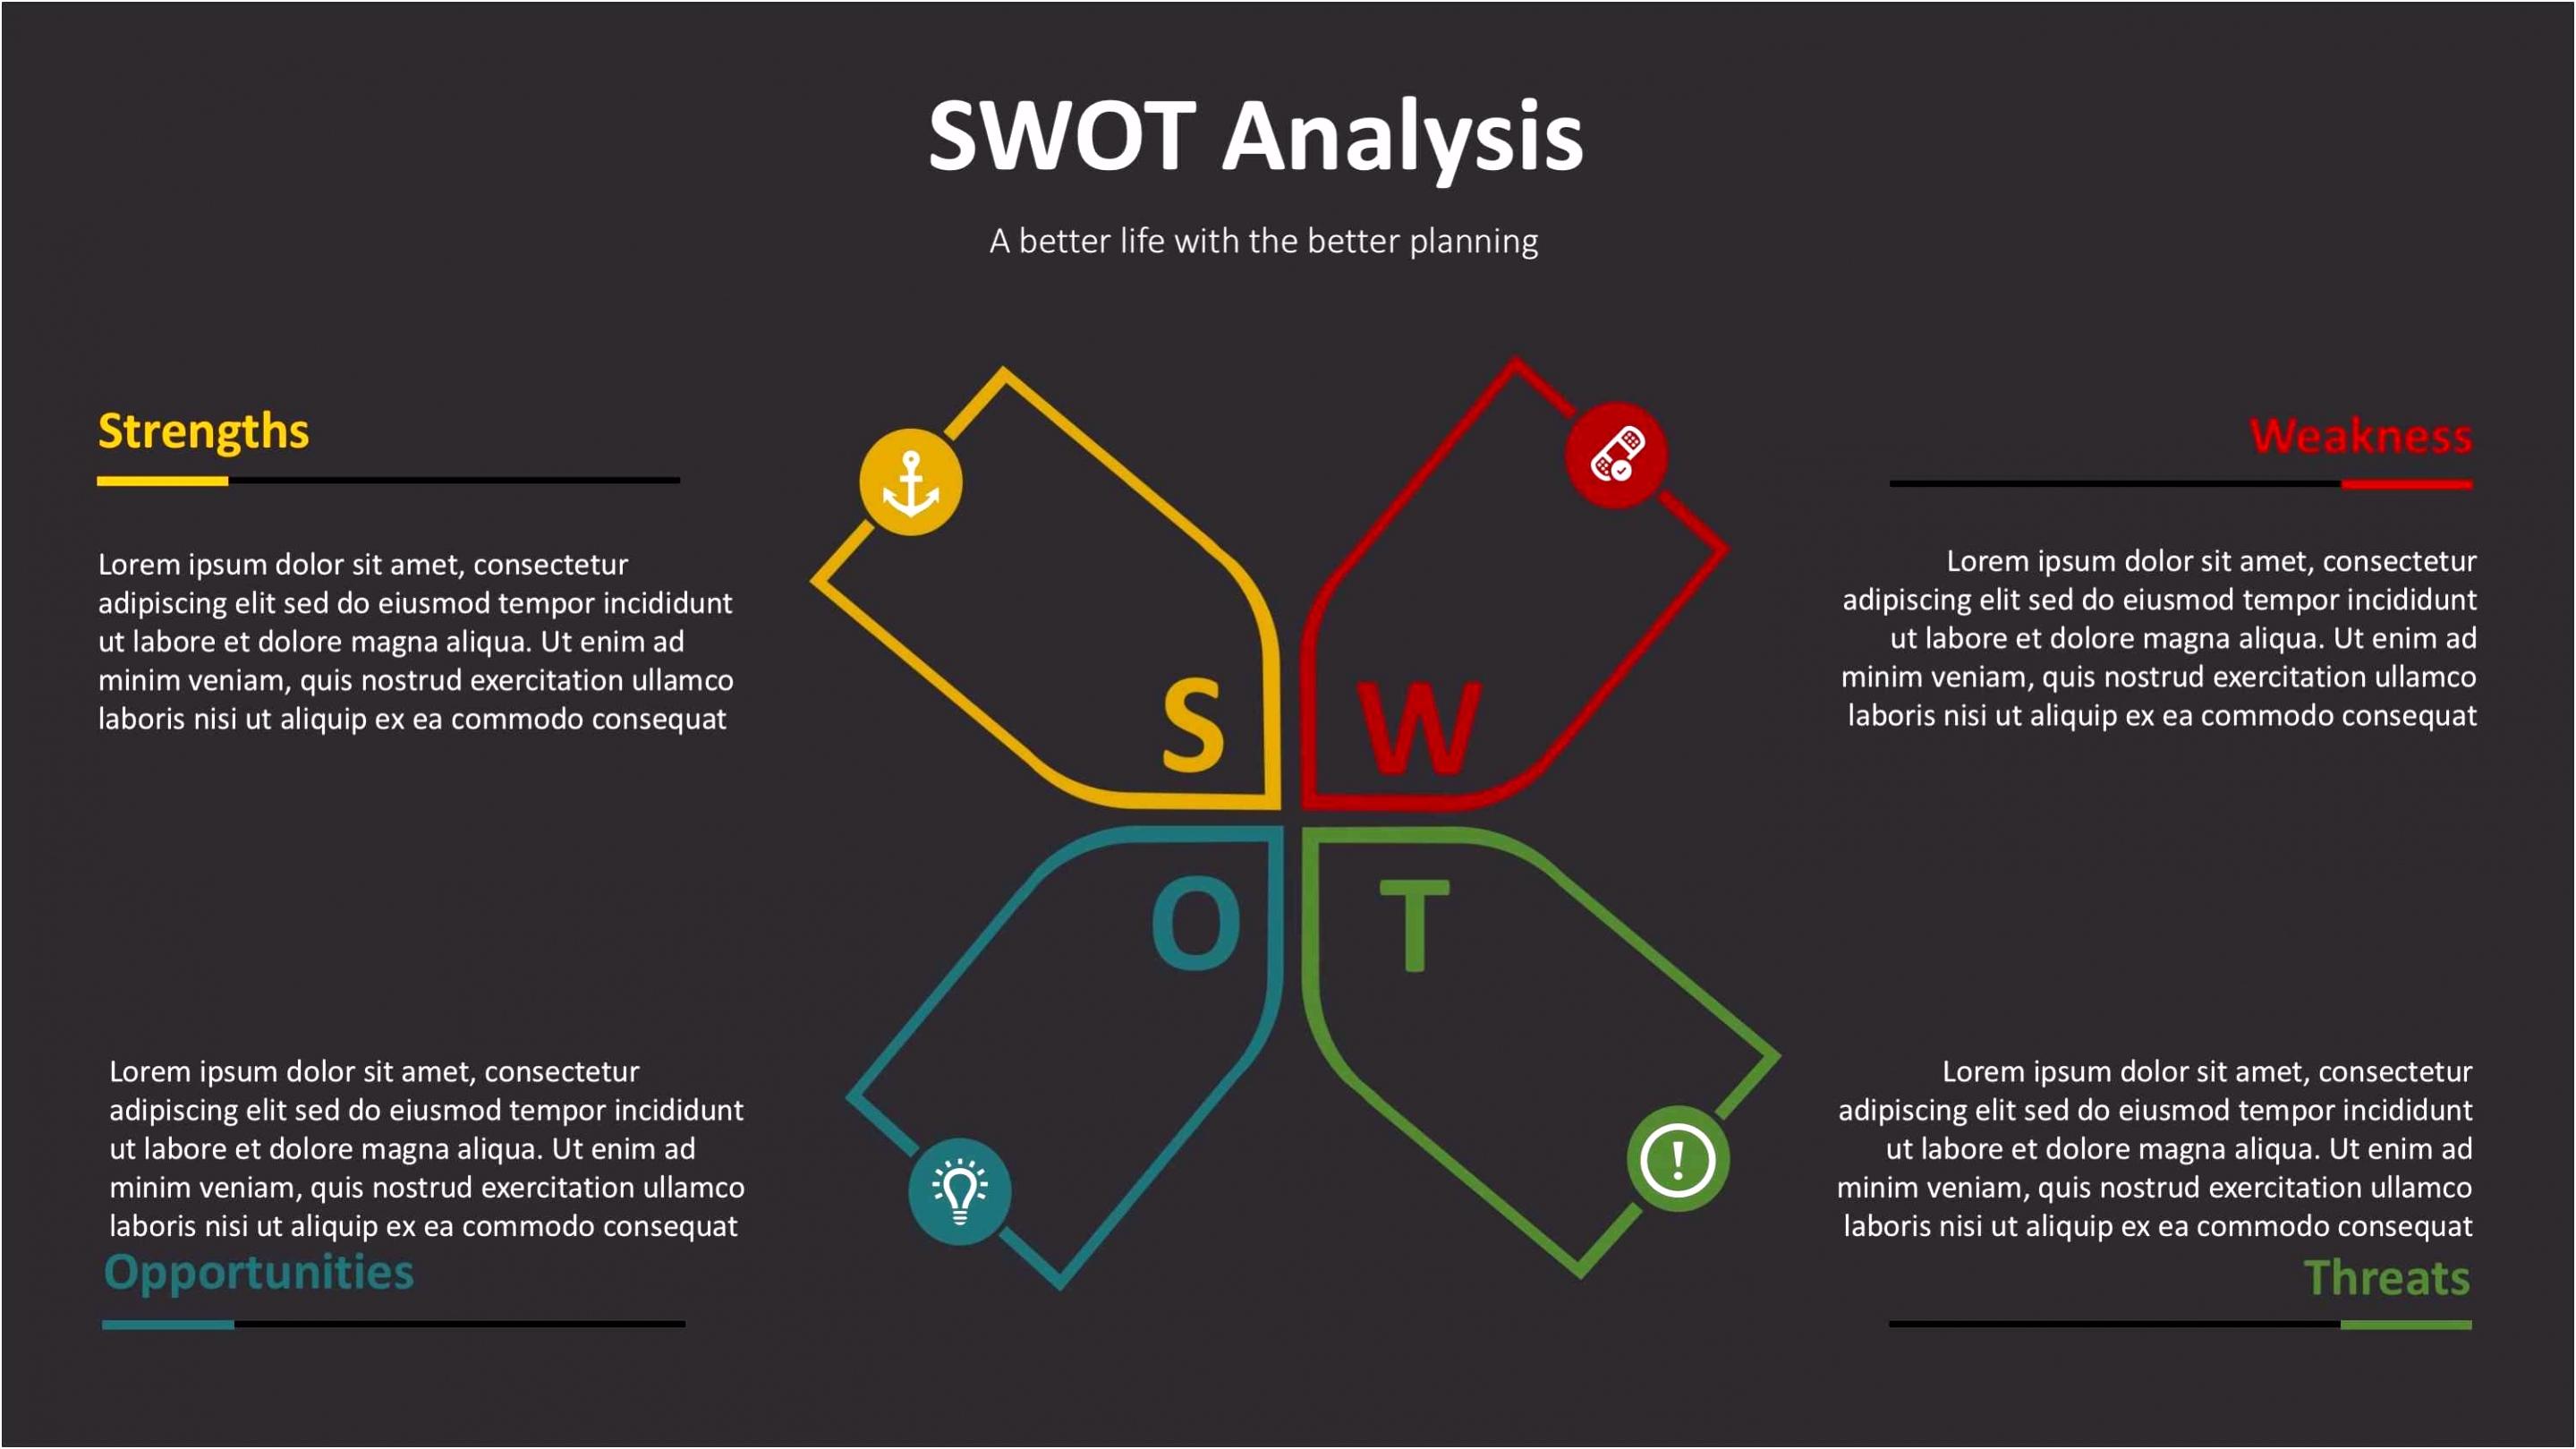 Volkswagen Swot Analysis 2017 for 44 Neu Wlan Nutzungsvereinbarung